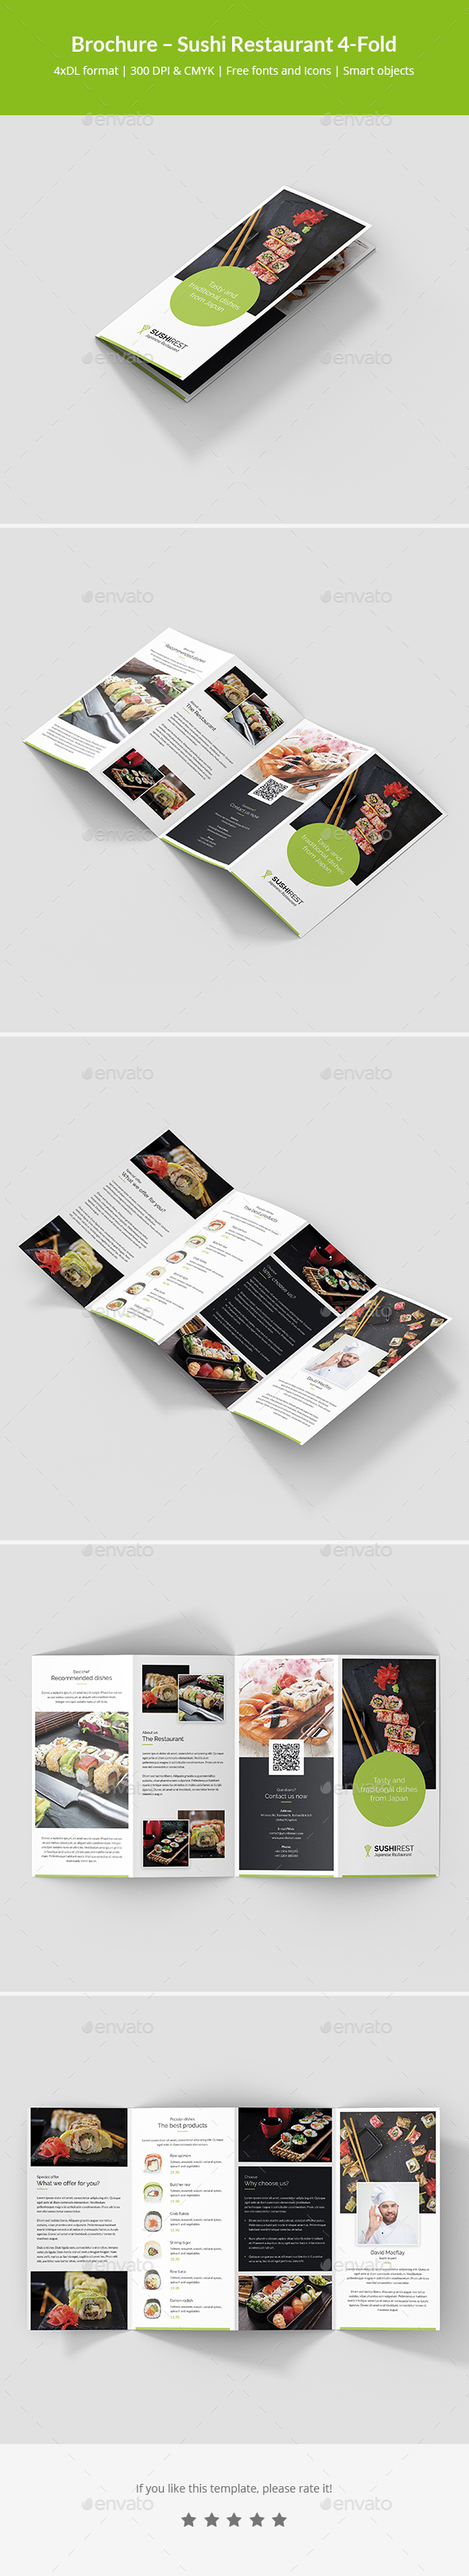 Brochure – Sushi Restaurant 4-Fold - Informational Brochures